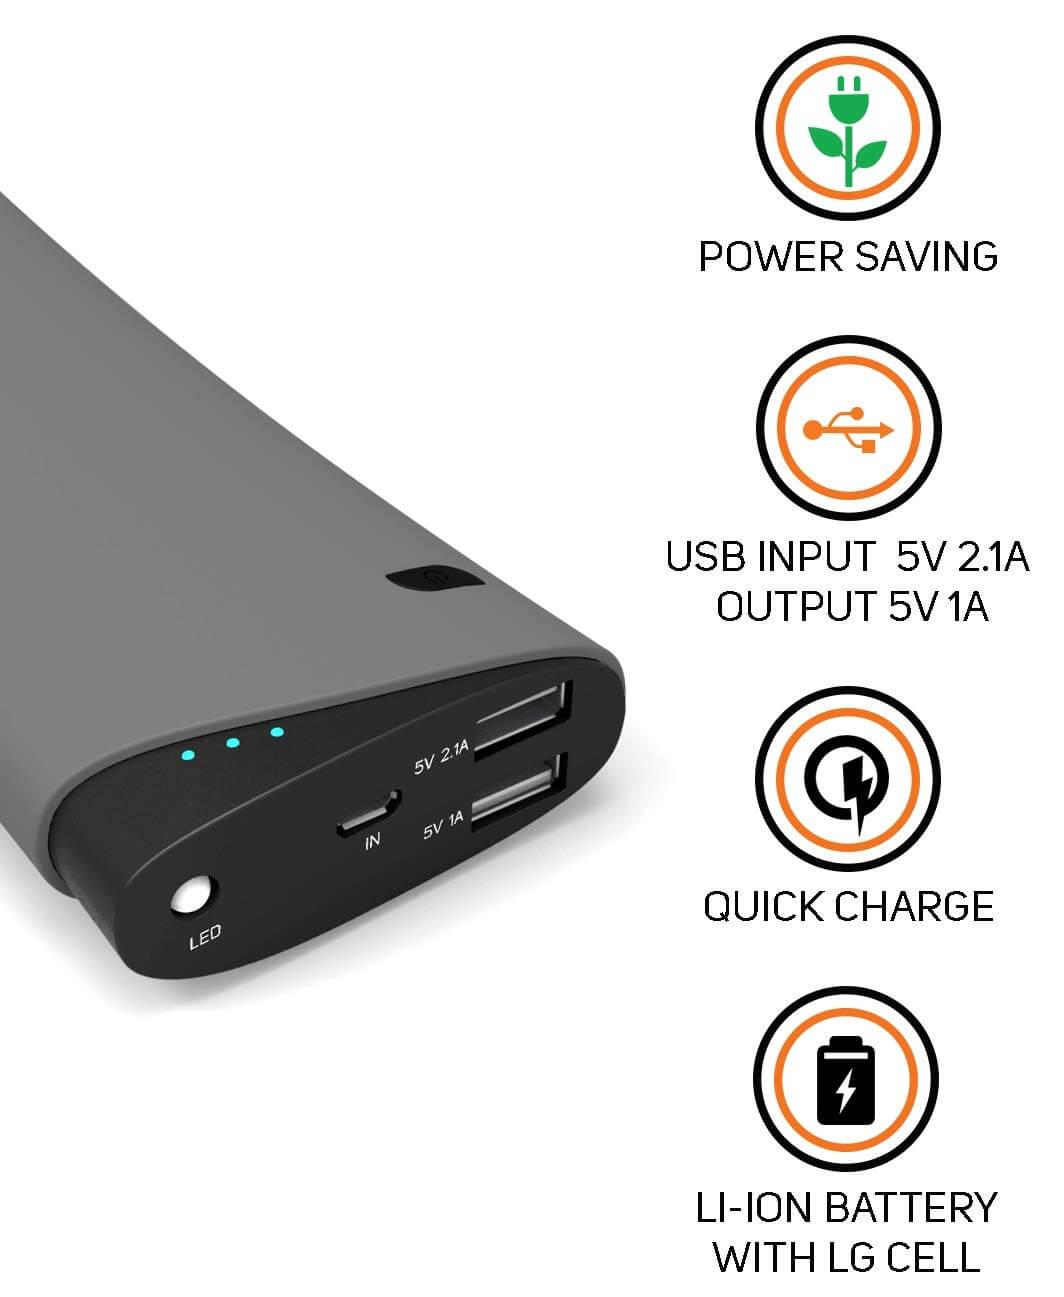 Micromax MXABP1301 powerbank